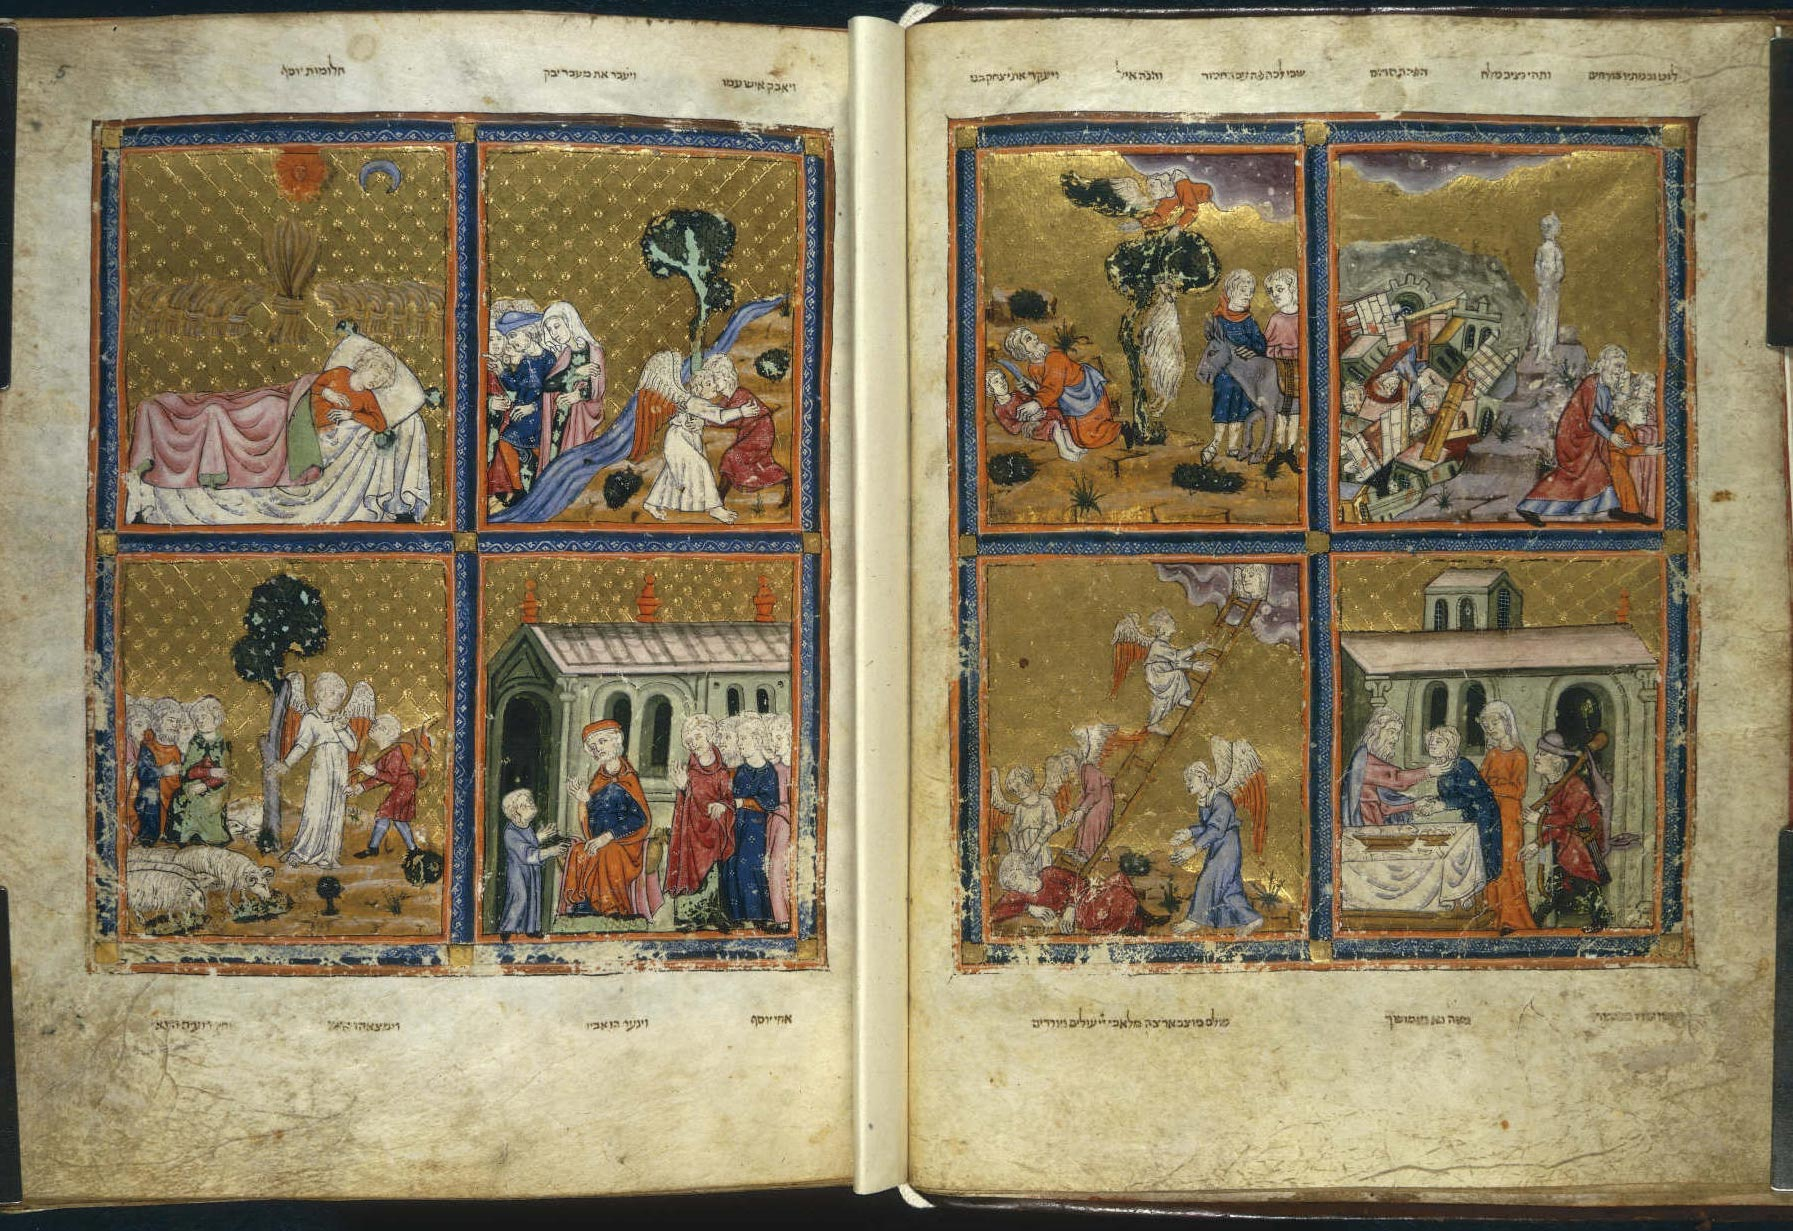 Golden Haggadah, f.4.